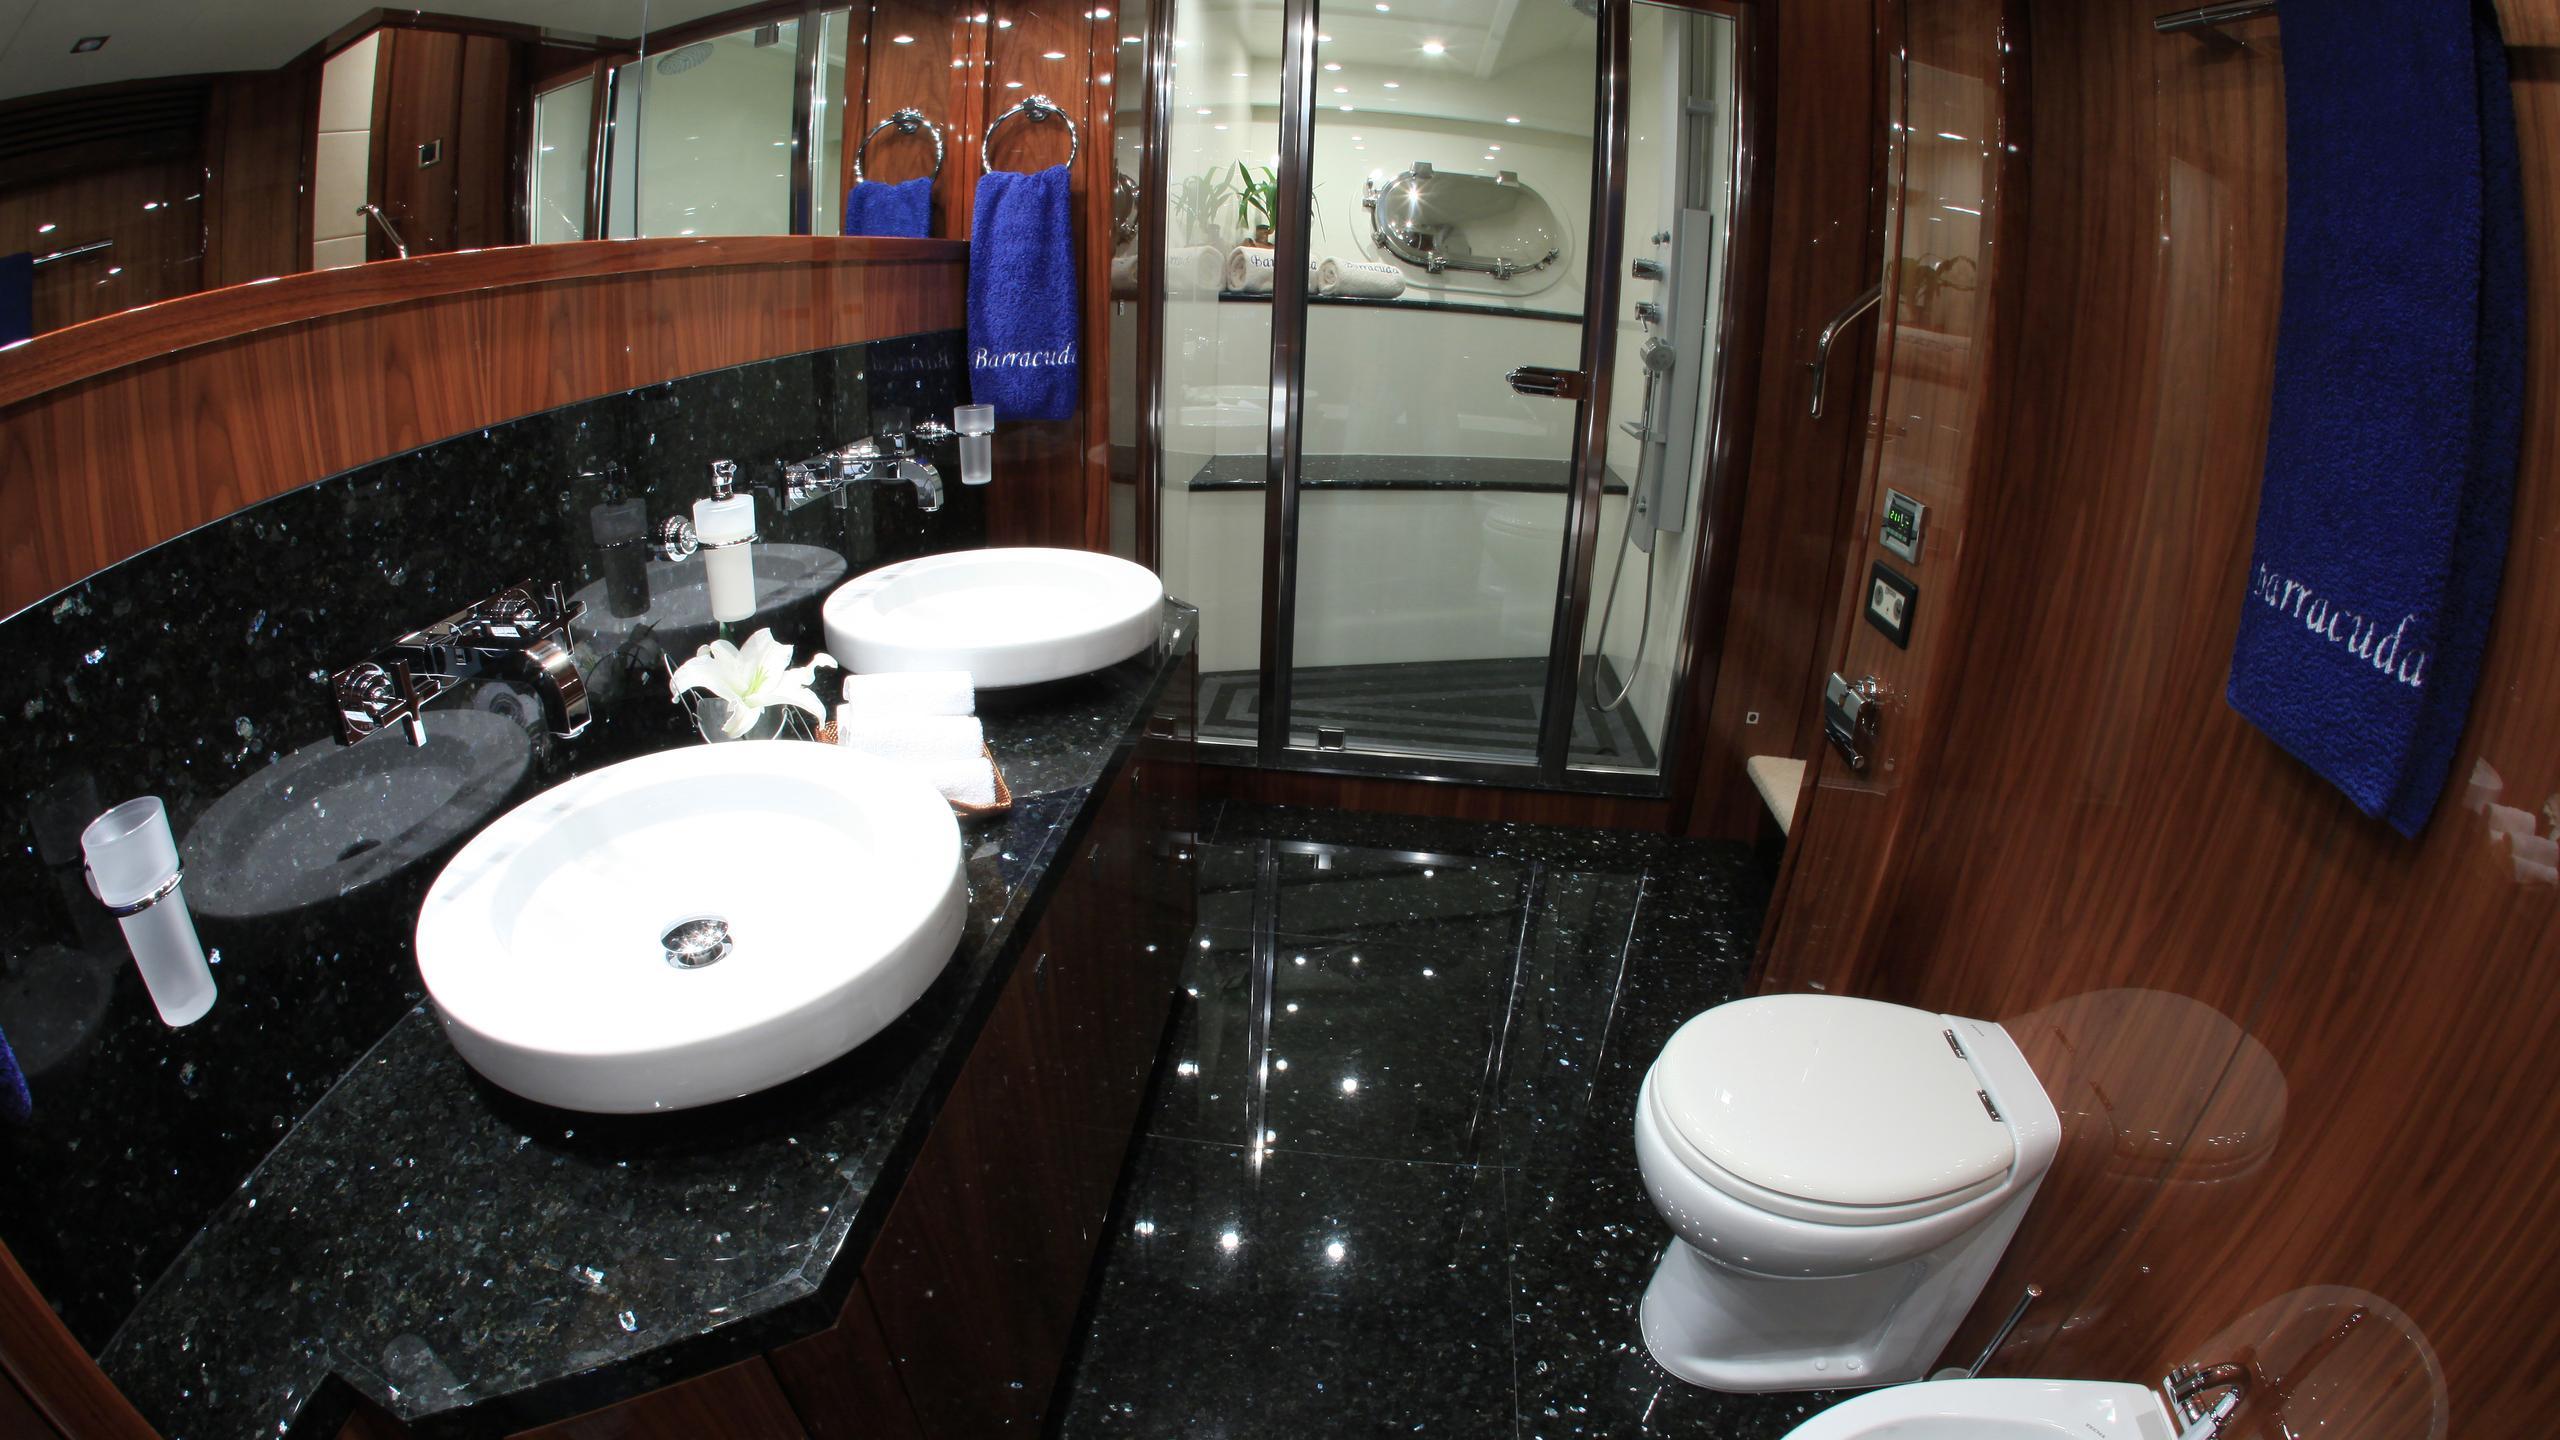 barracuda-red-sea-yacht-bathroom